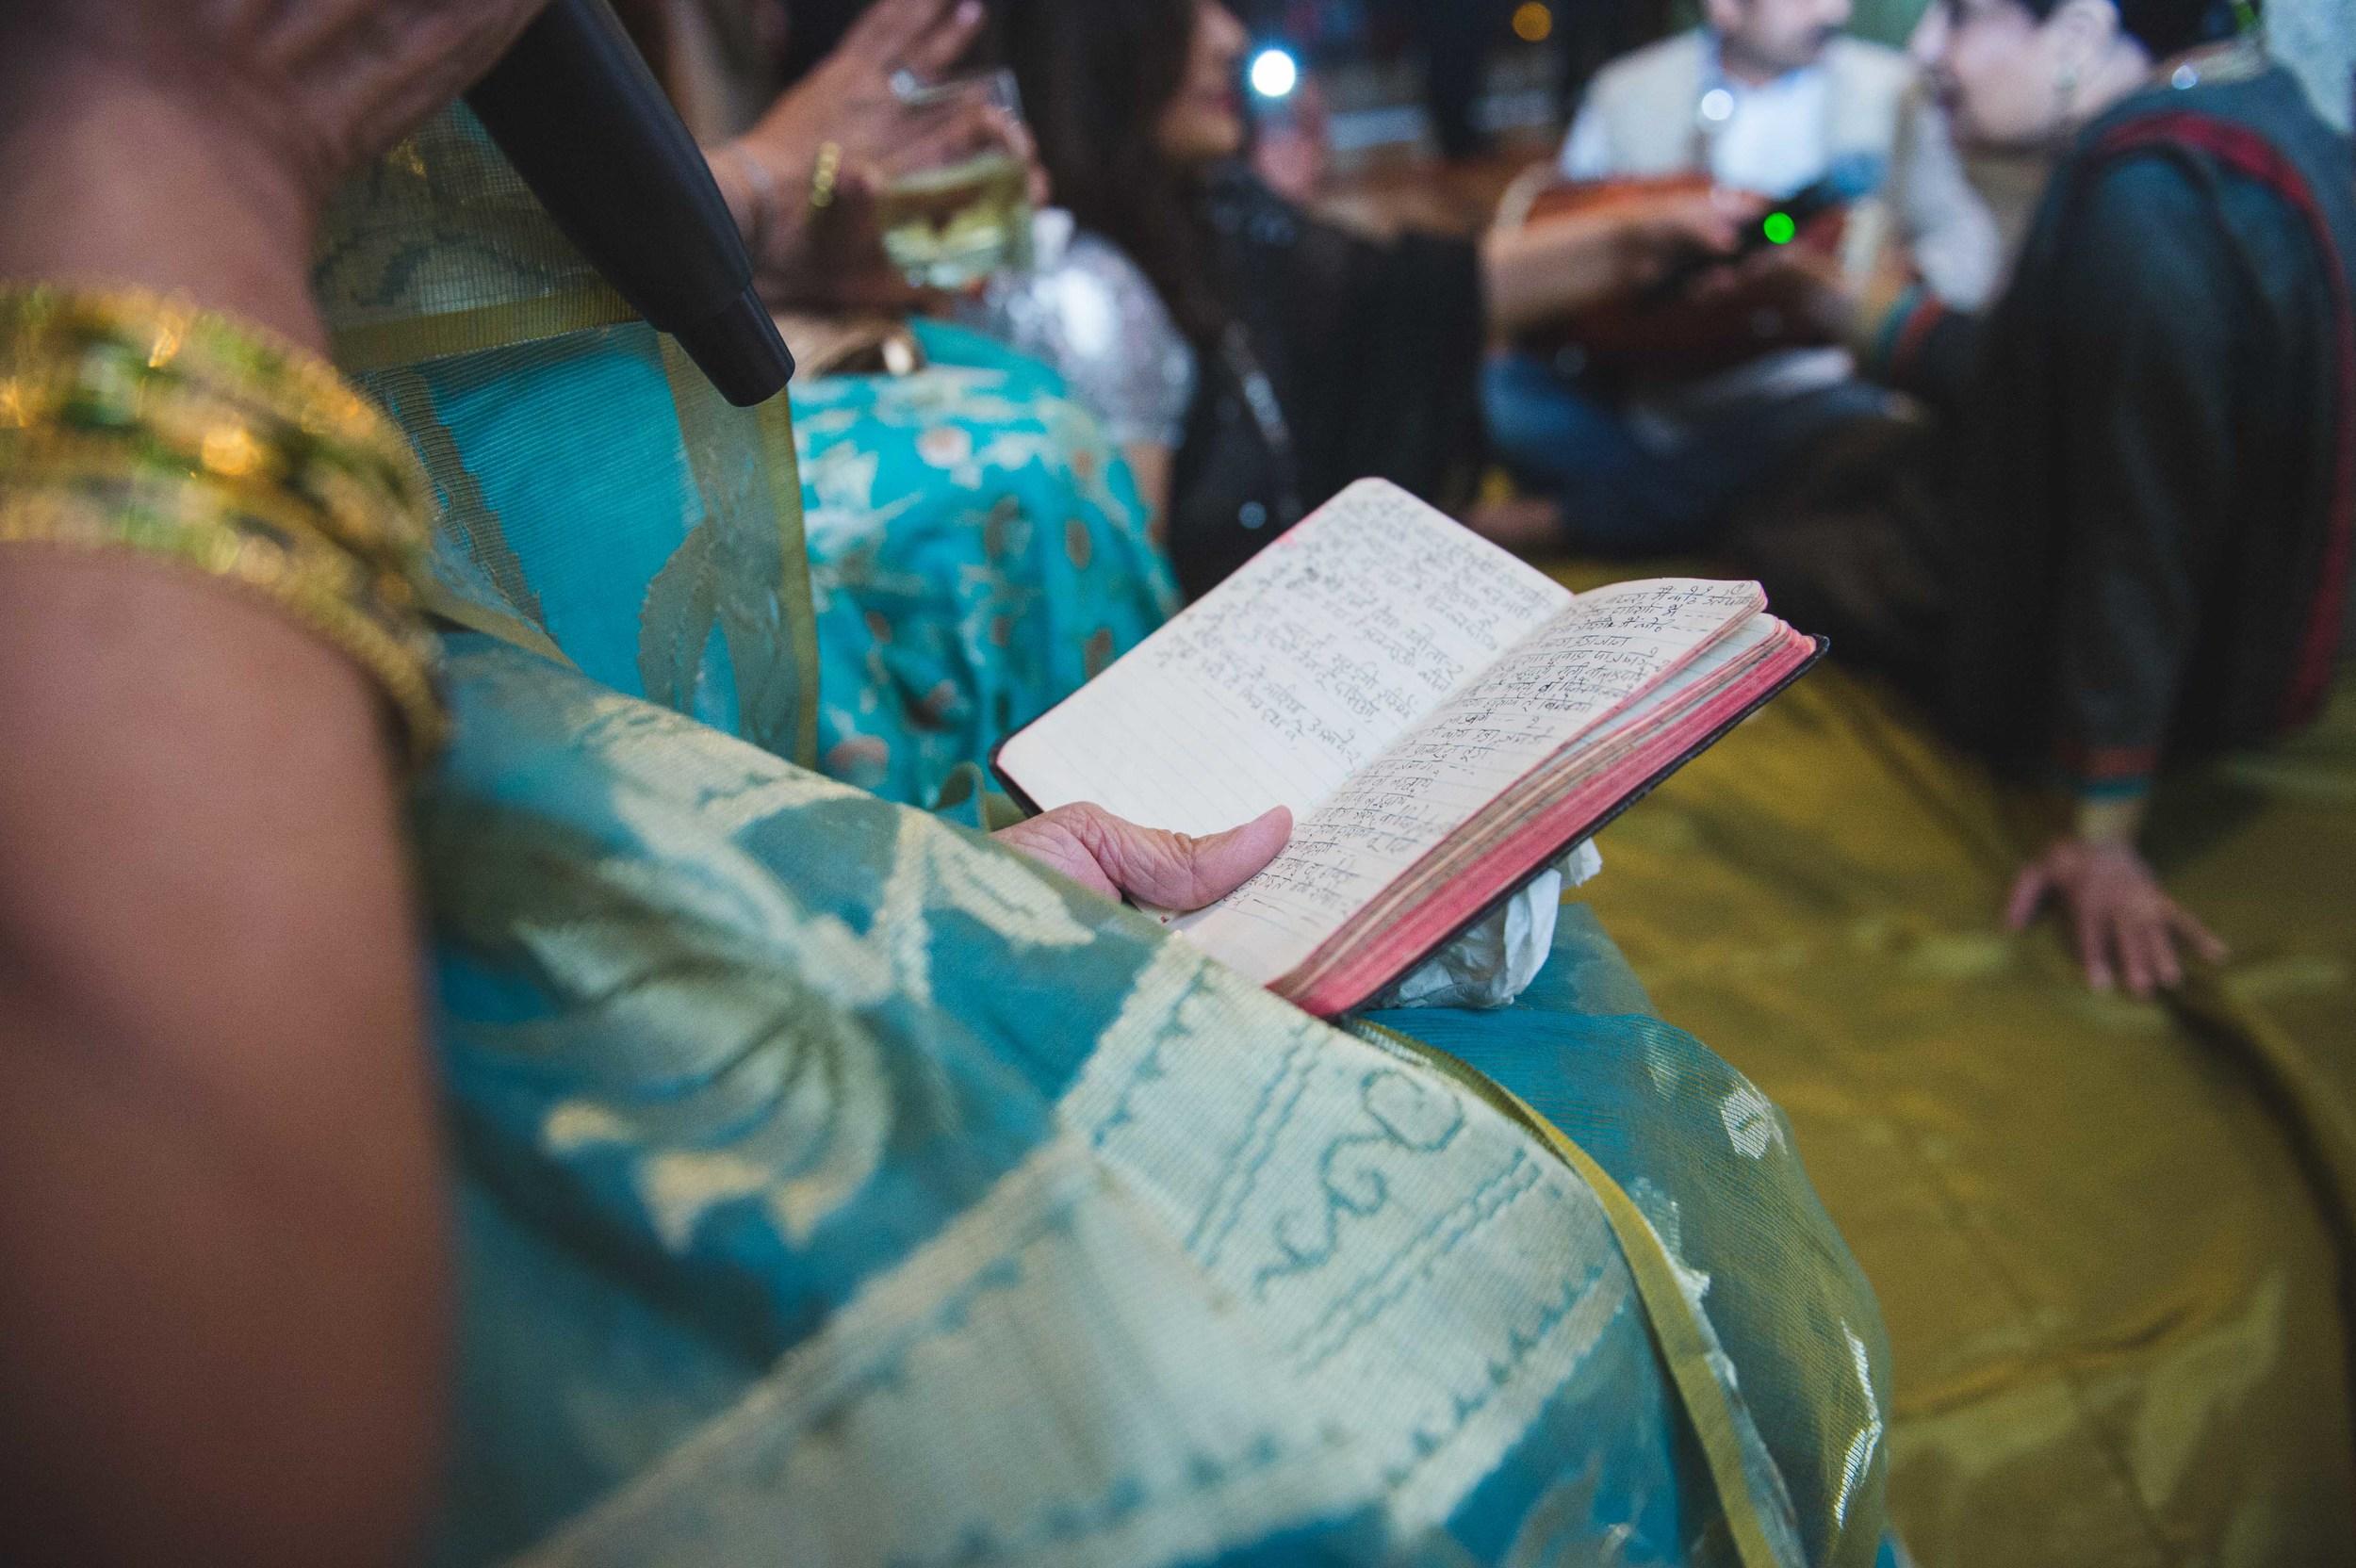 Indian Pre-wedding  at Arena Stage Washington DC by Mantas Kubilinskas-24.jpg